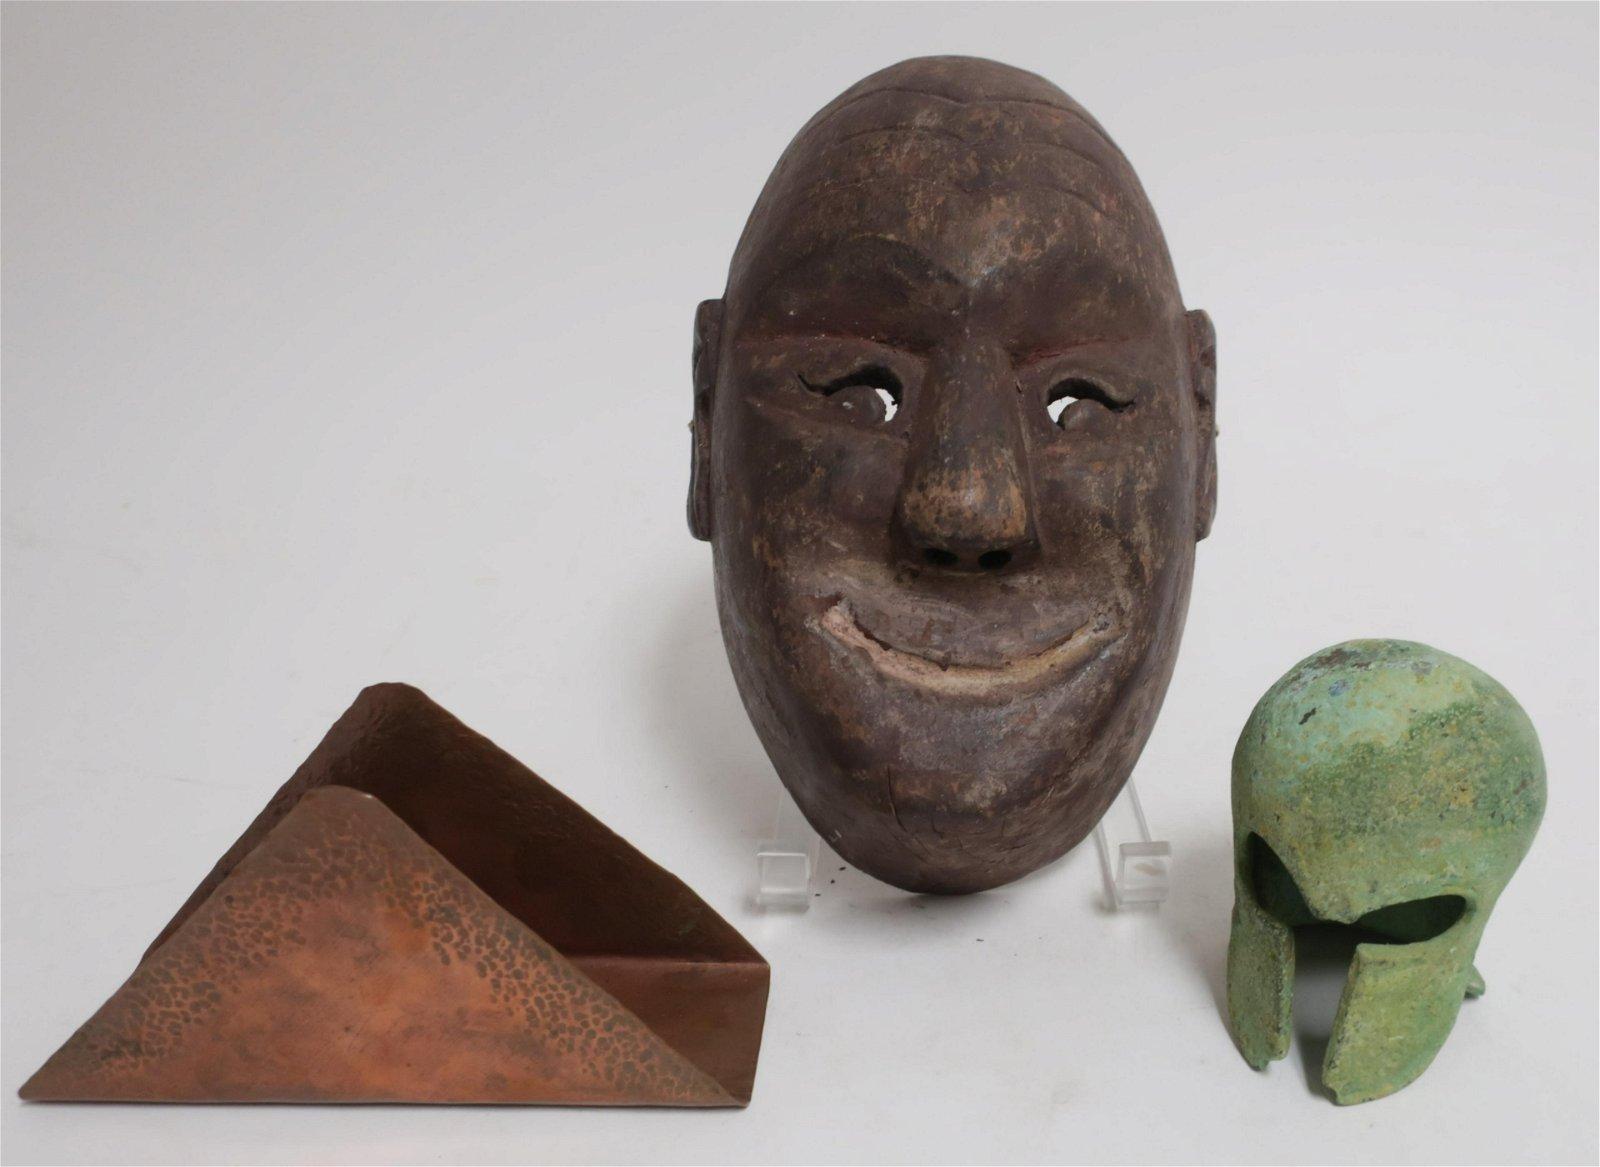 Antique Noh Mask, Small Bronze Spartan Helmet